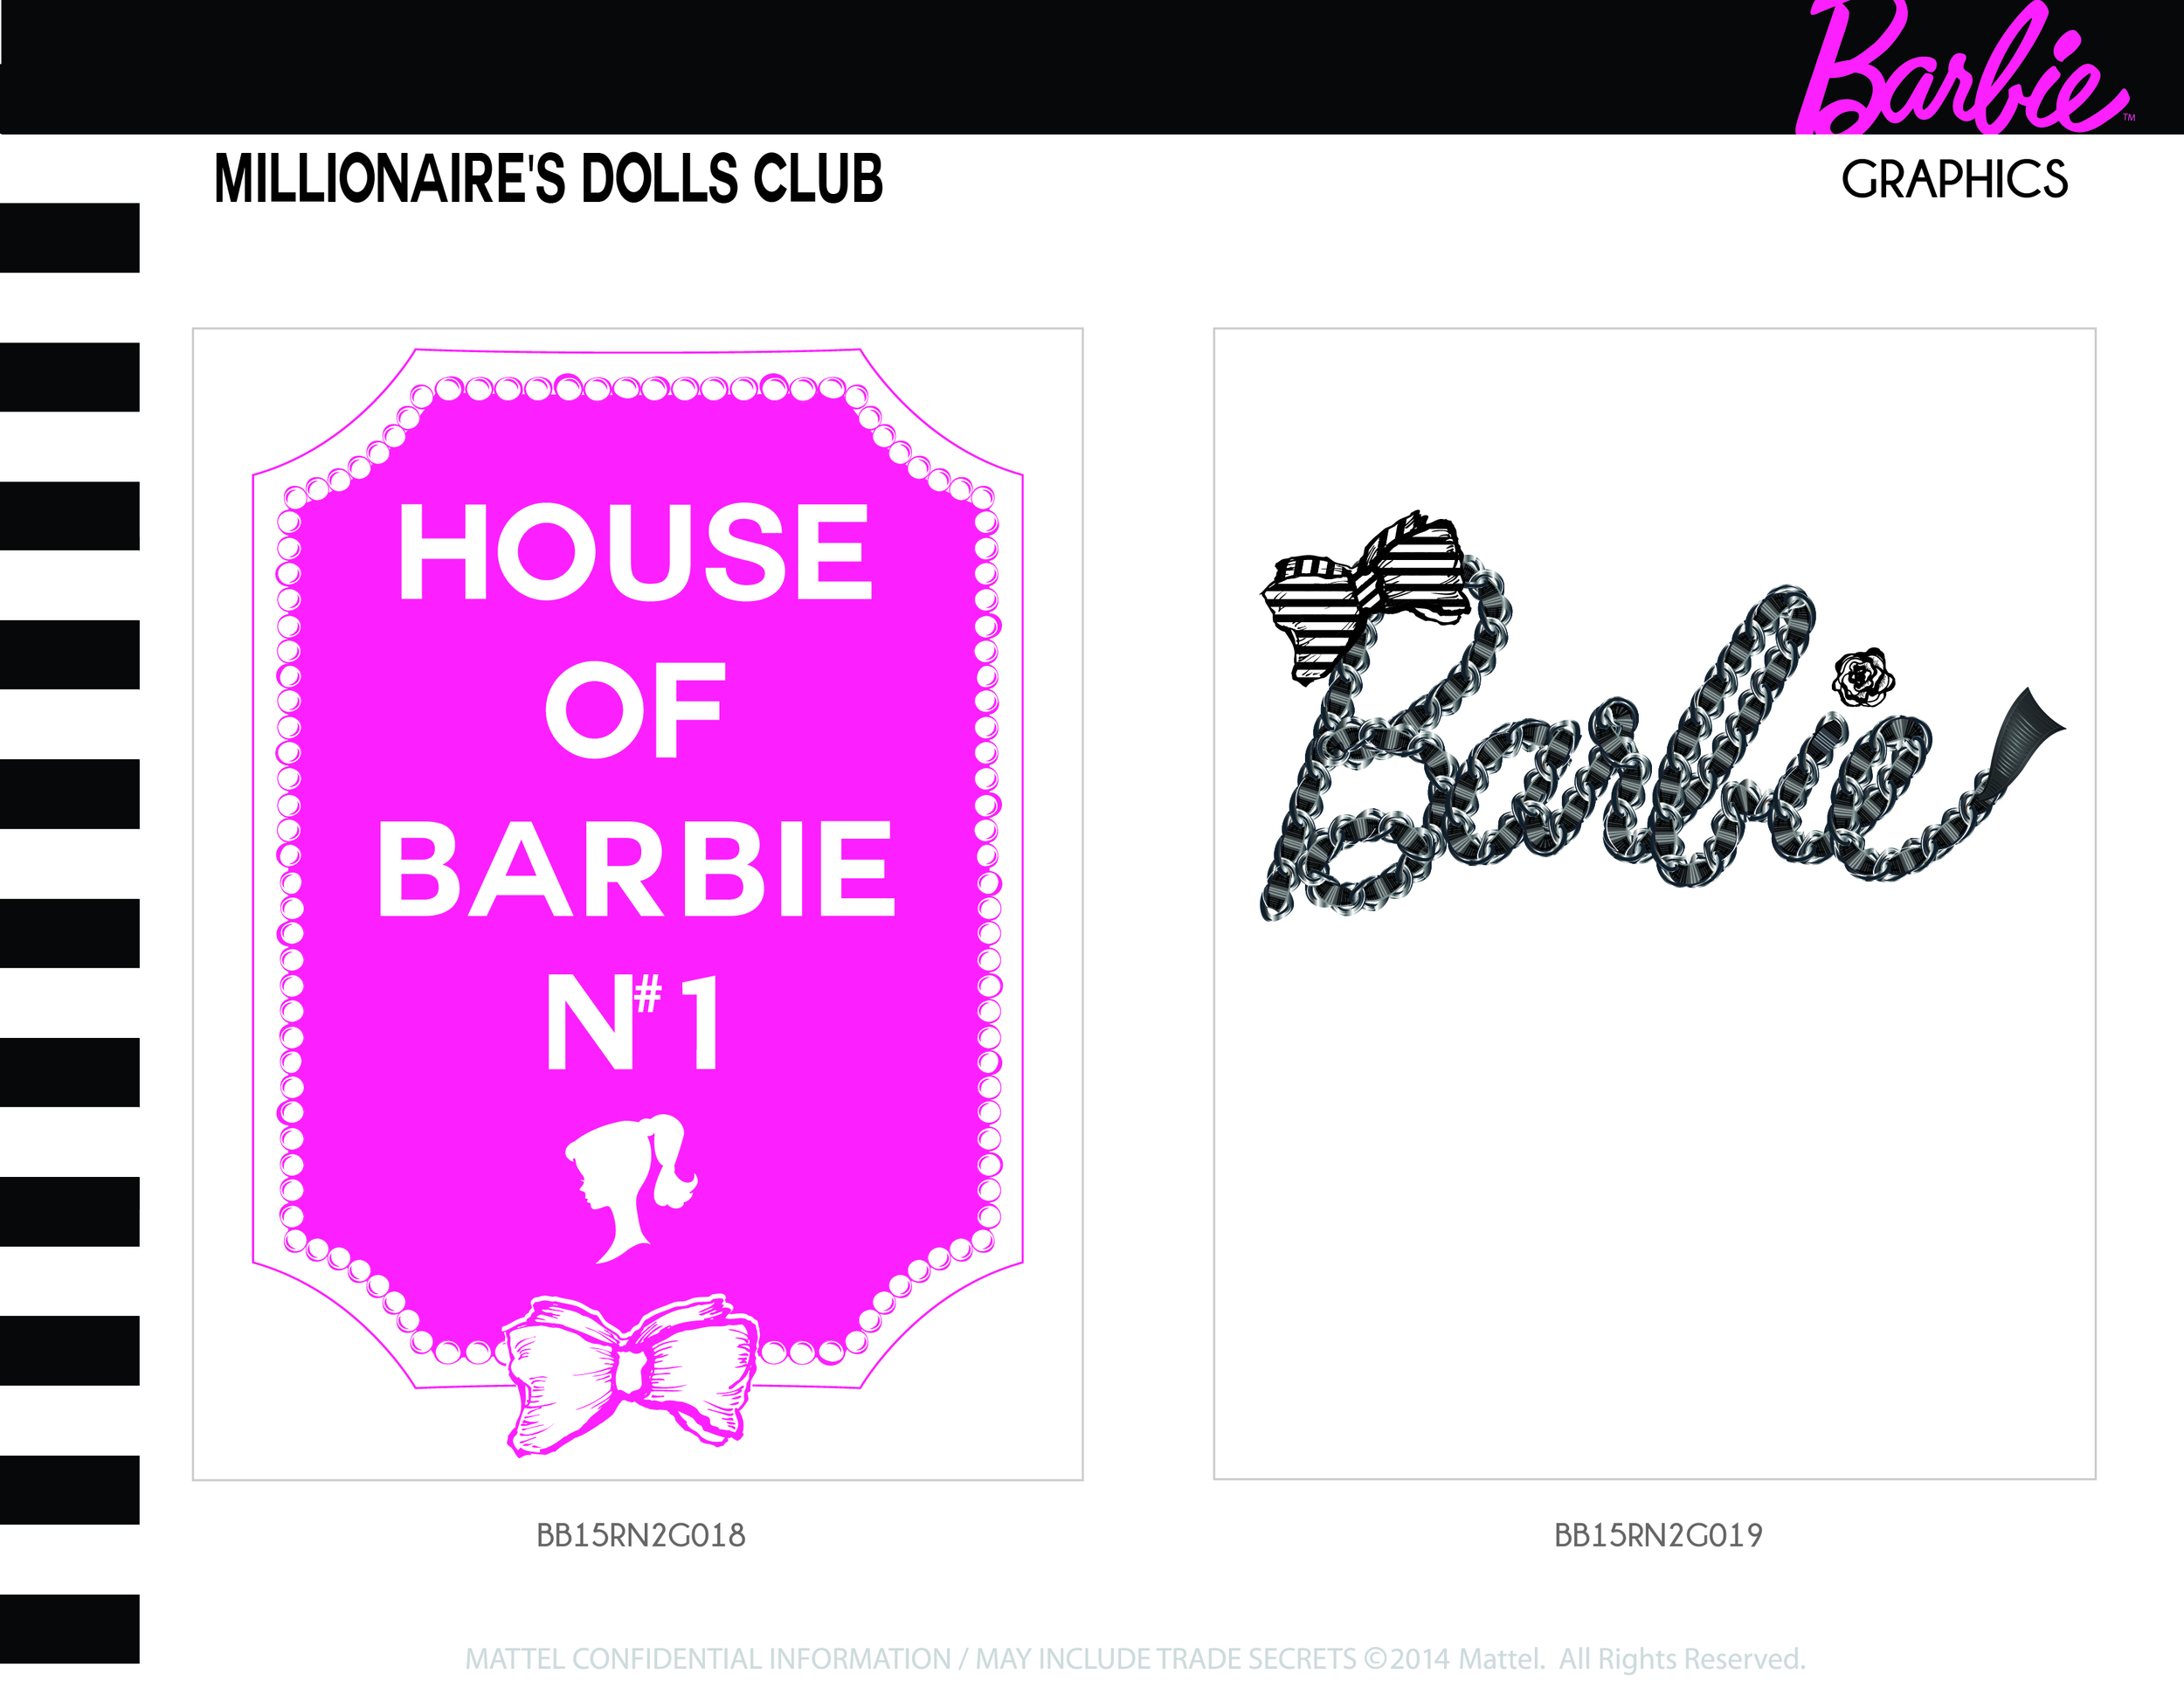 Millionaire's Dolls Club Graphics 1-2